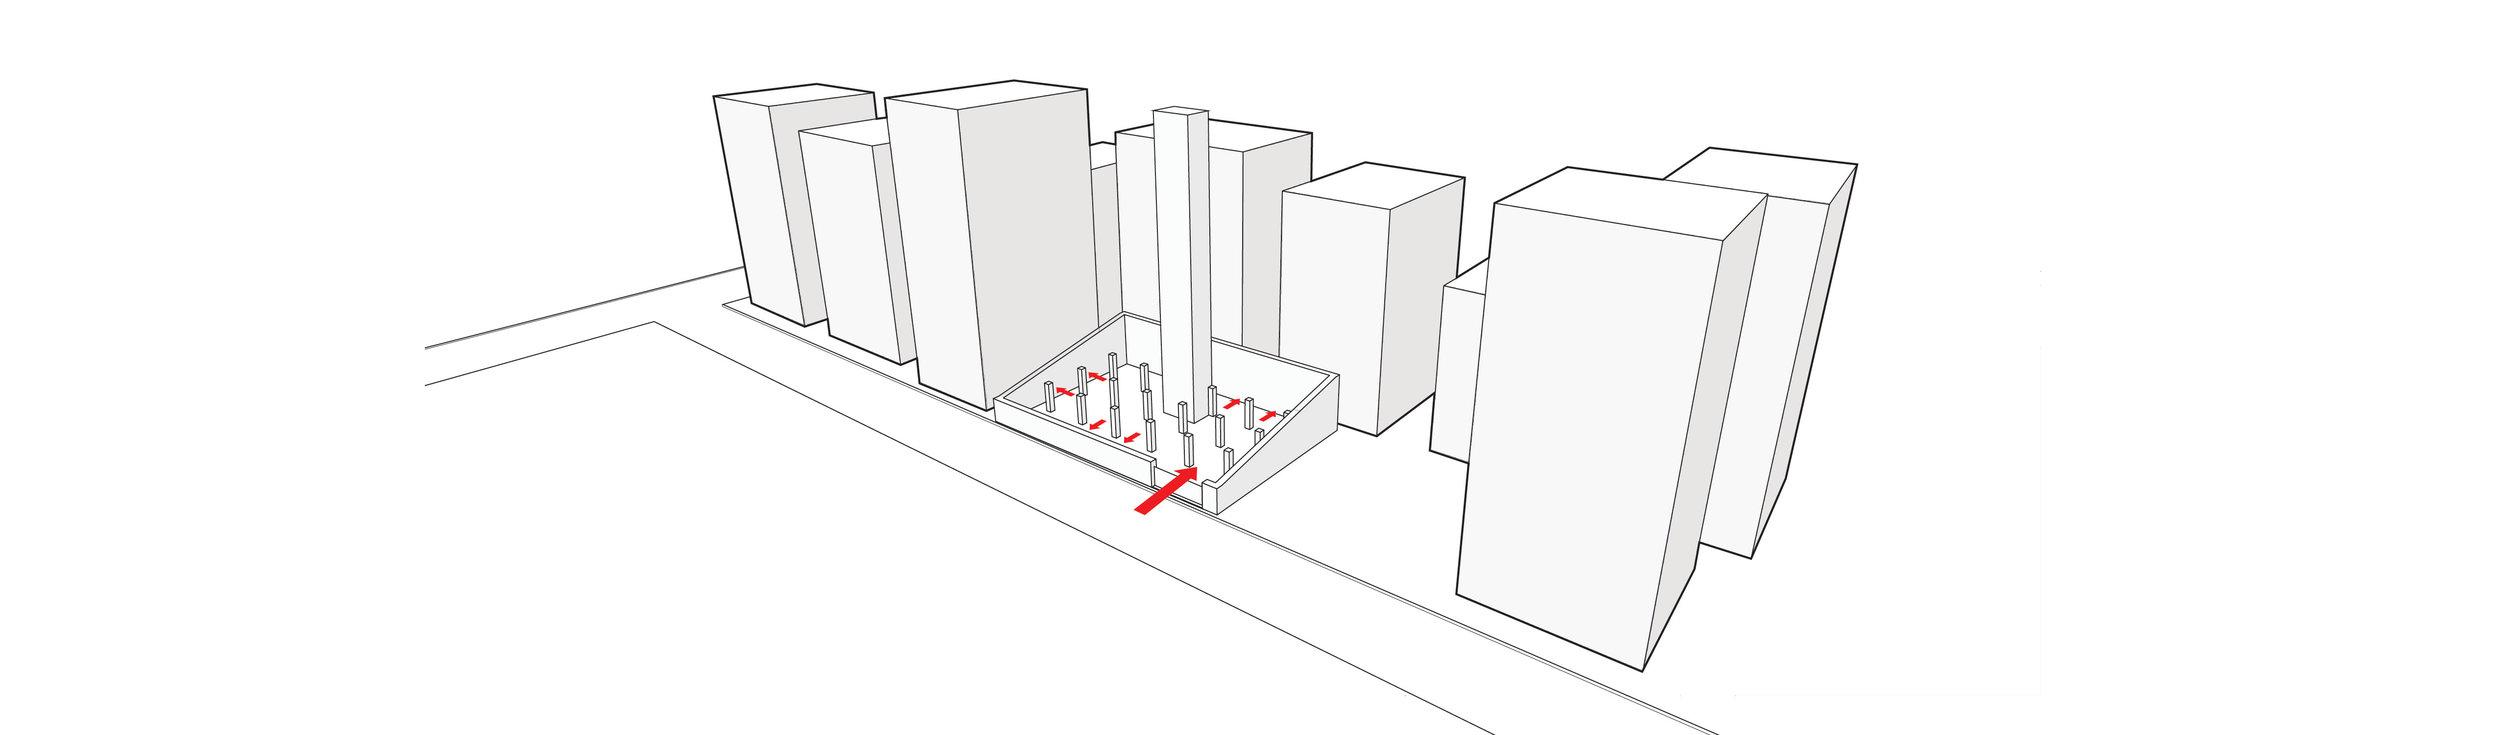 Diagrams-02.jpg